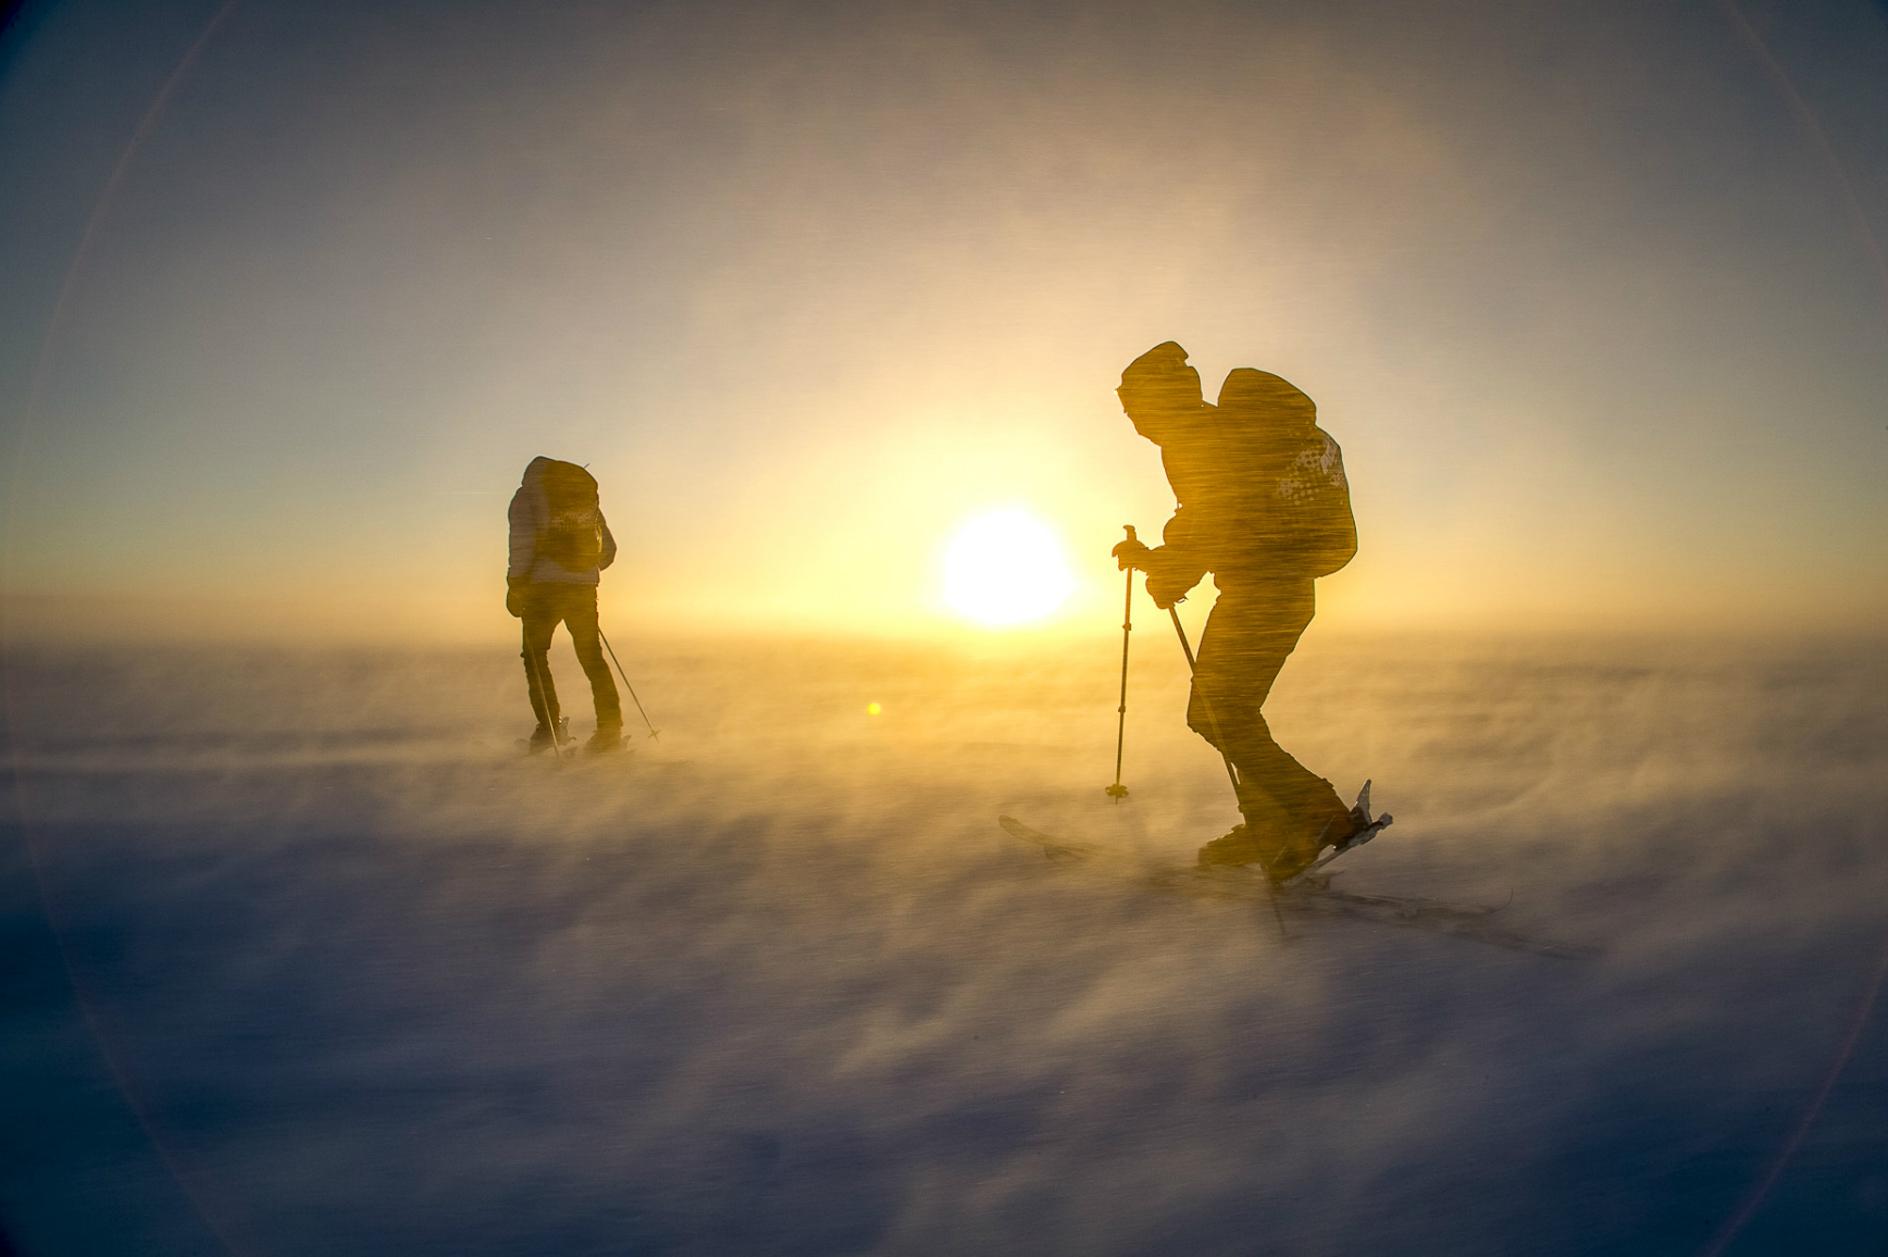 Cory-Richards-Photographer-Antarctica-22.jpg